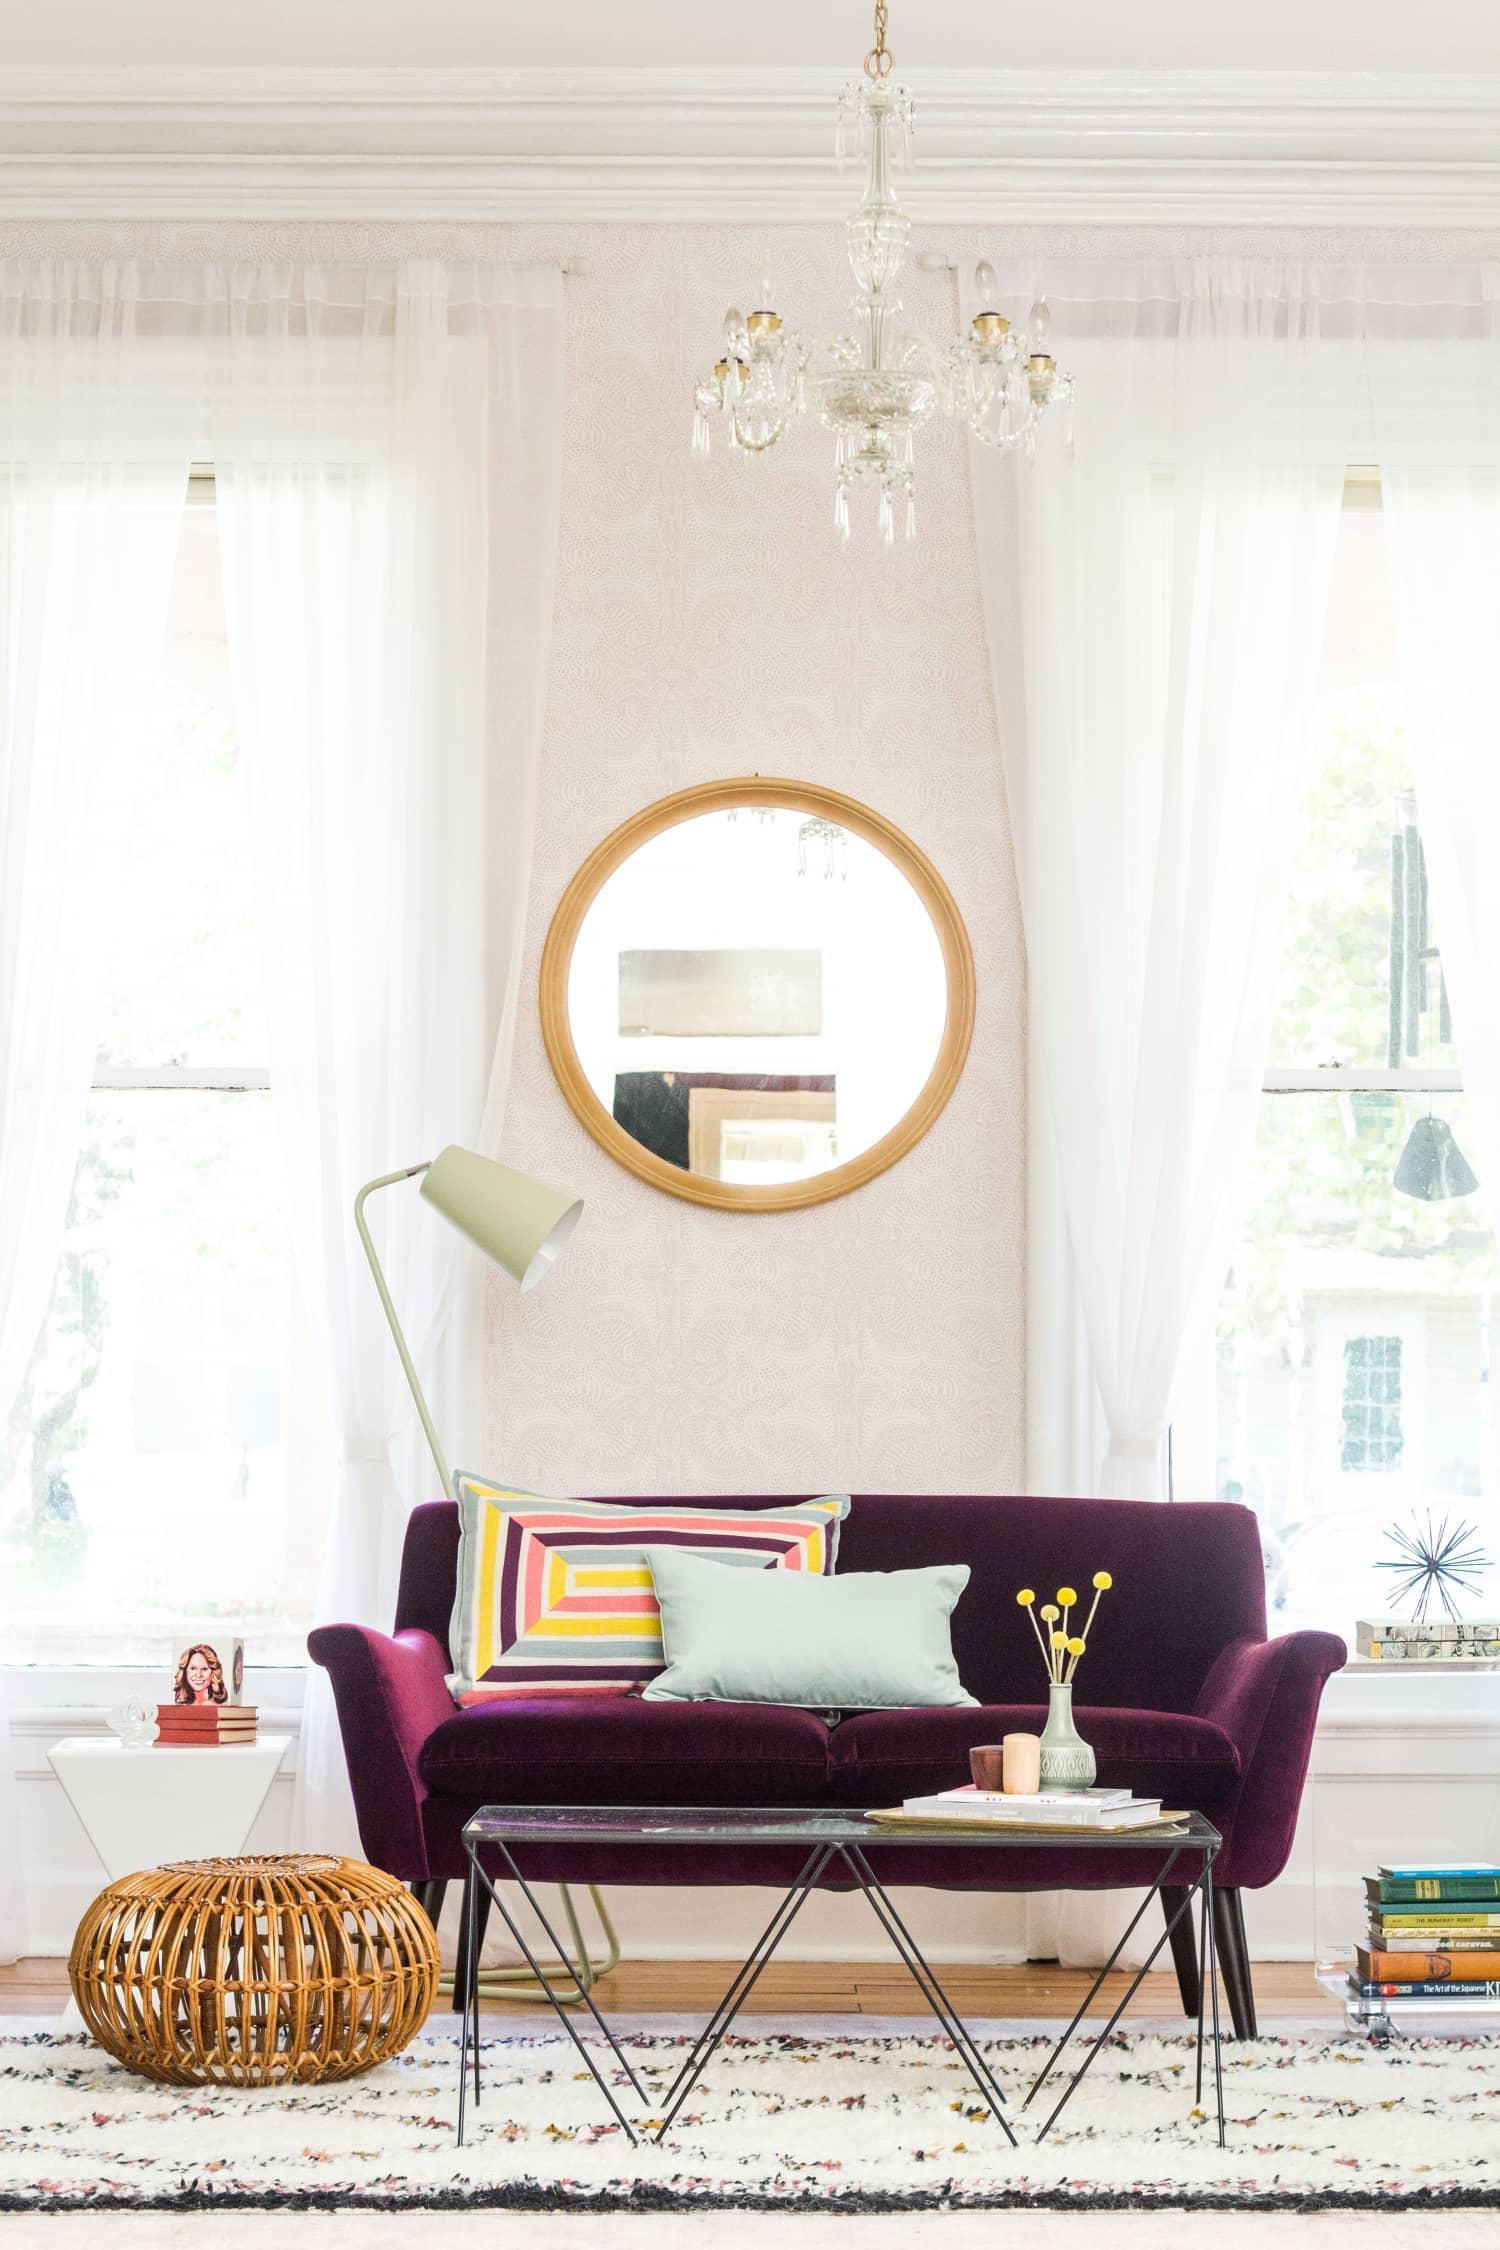 Design School Case Study: How We Chose Ashley's Living Room Rugs